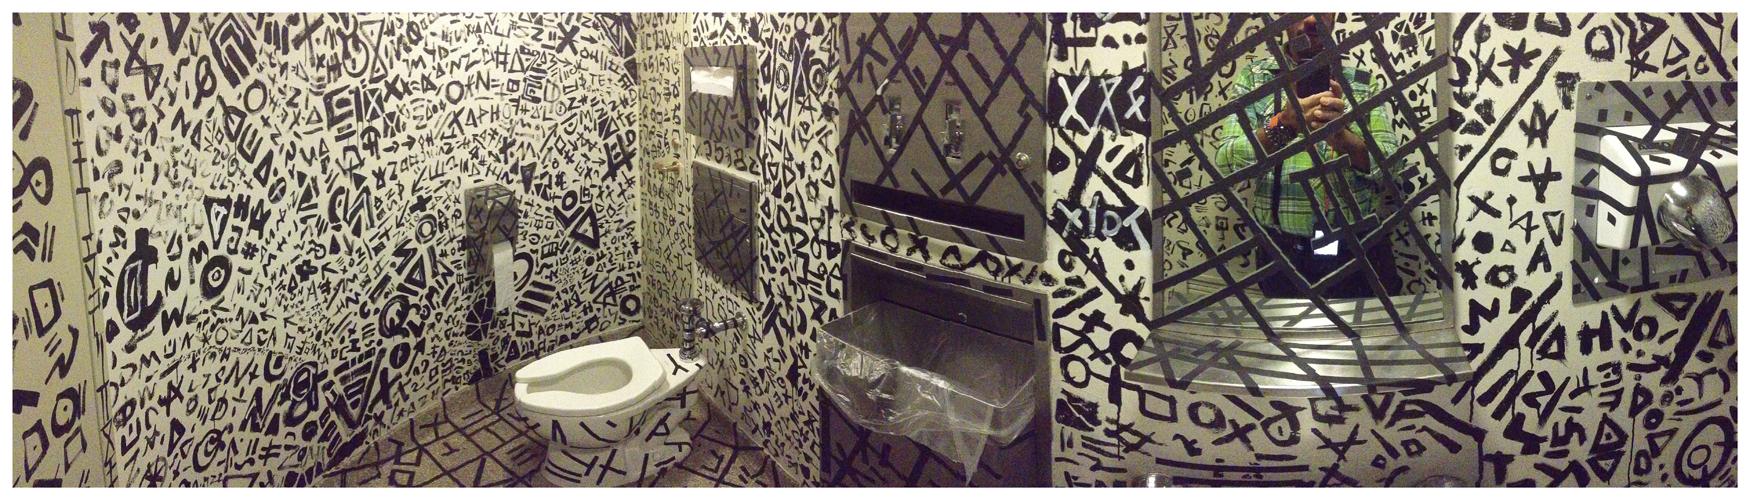 Modern Jazz WC (Gutai) | New York | Jaime Scatena (After Shūji Mukai)